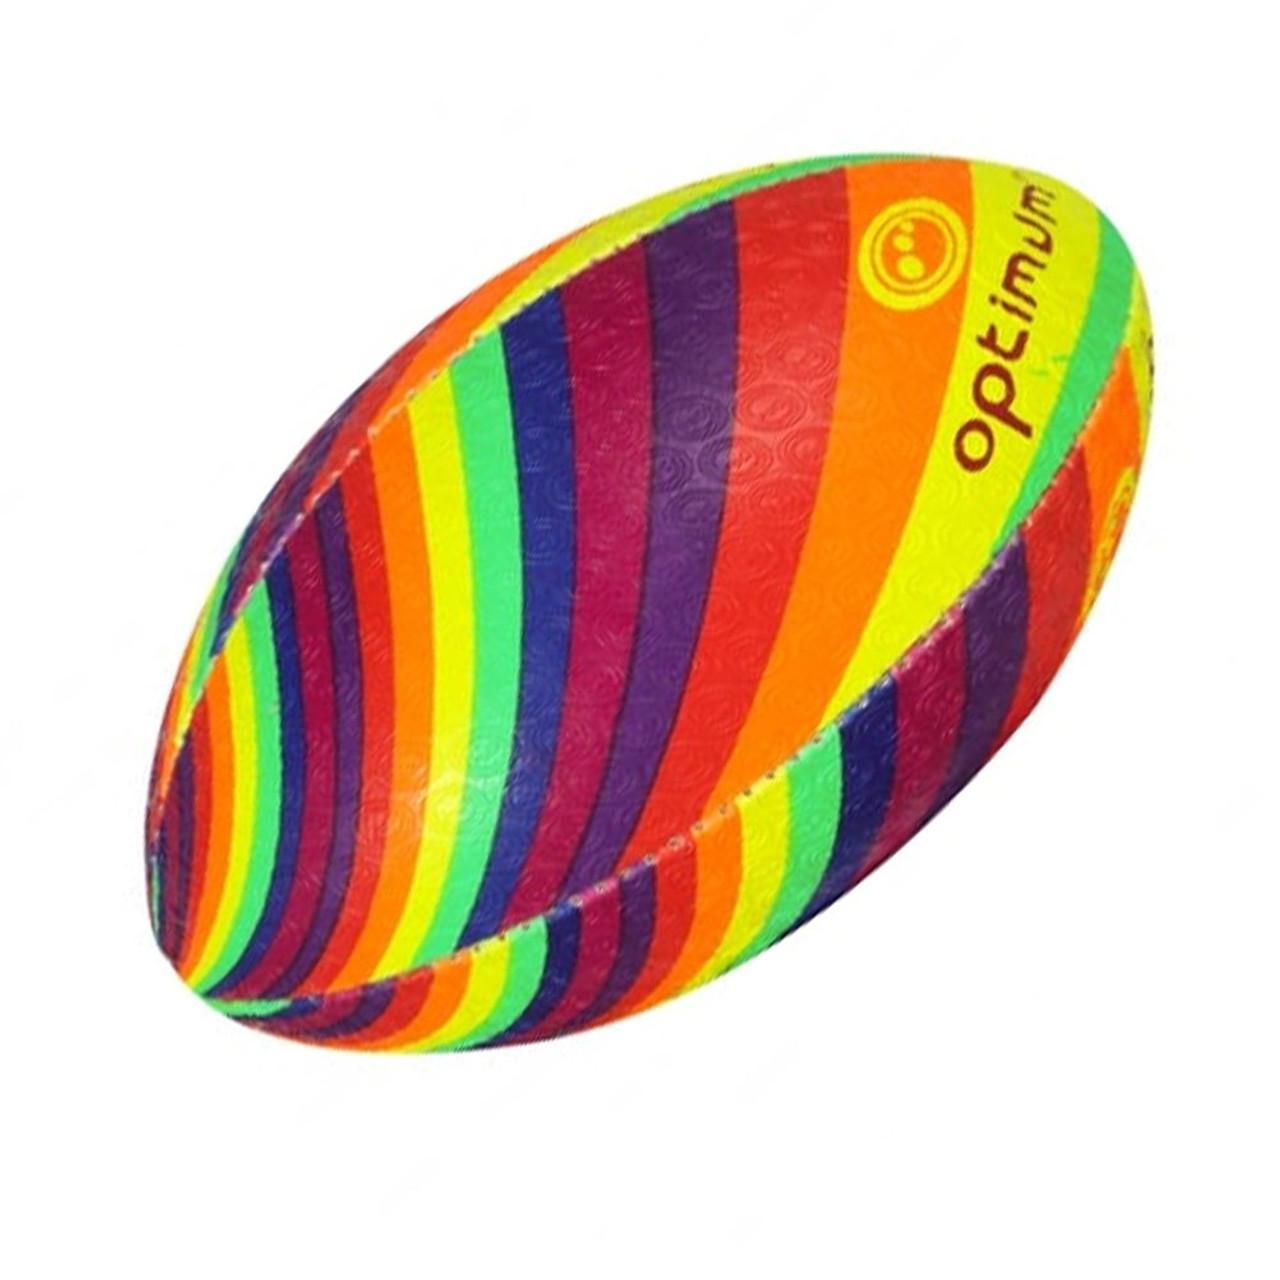 OPTIMUM Cartoon Rainbow Twister rugby ball - MIDI